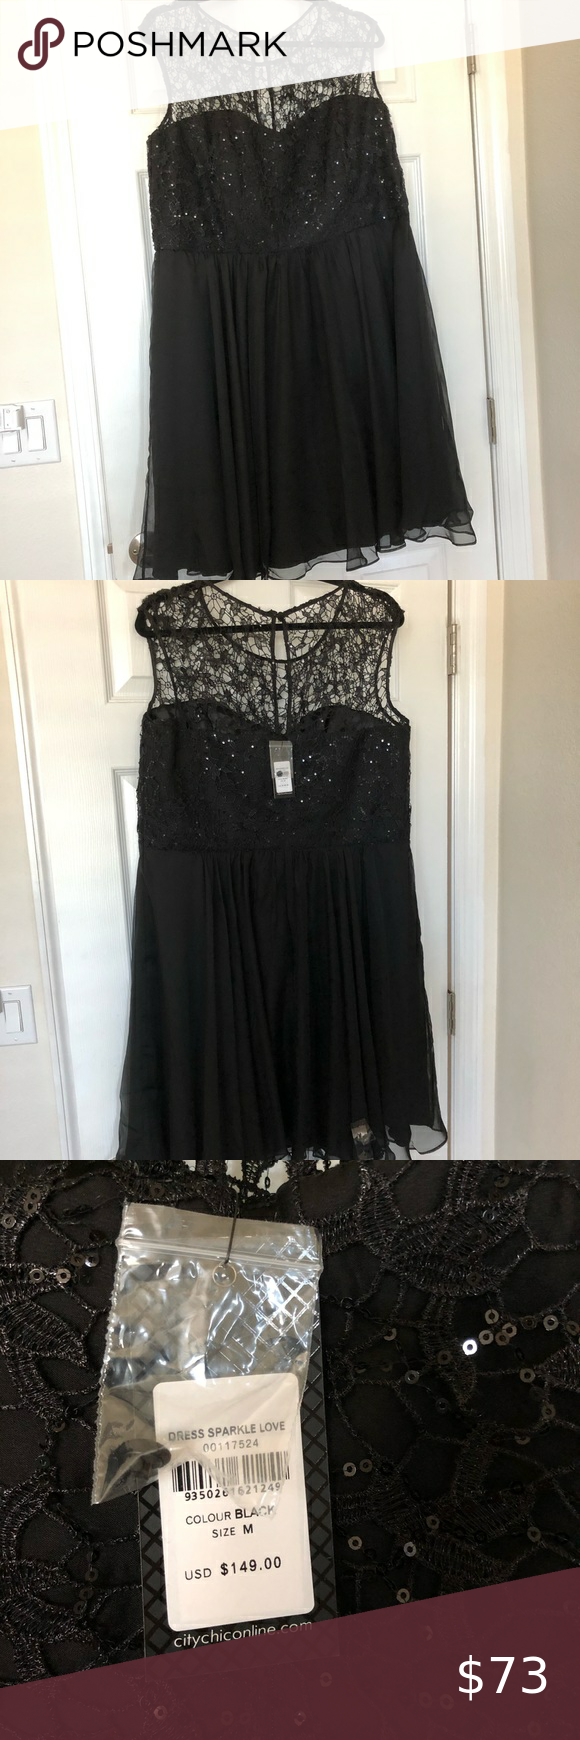 Beautiful Black Sparkle Dress In 2021 Black Sparkle Dress Sparkle Dress Chic Lace Dress [ 1740 x 580 Pixel ]